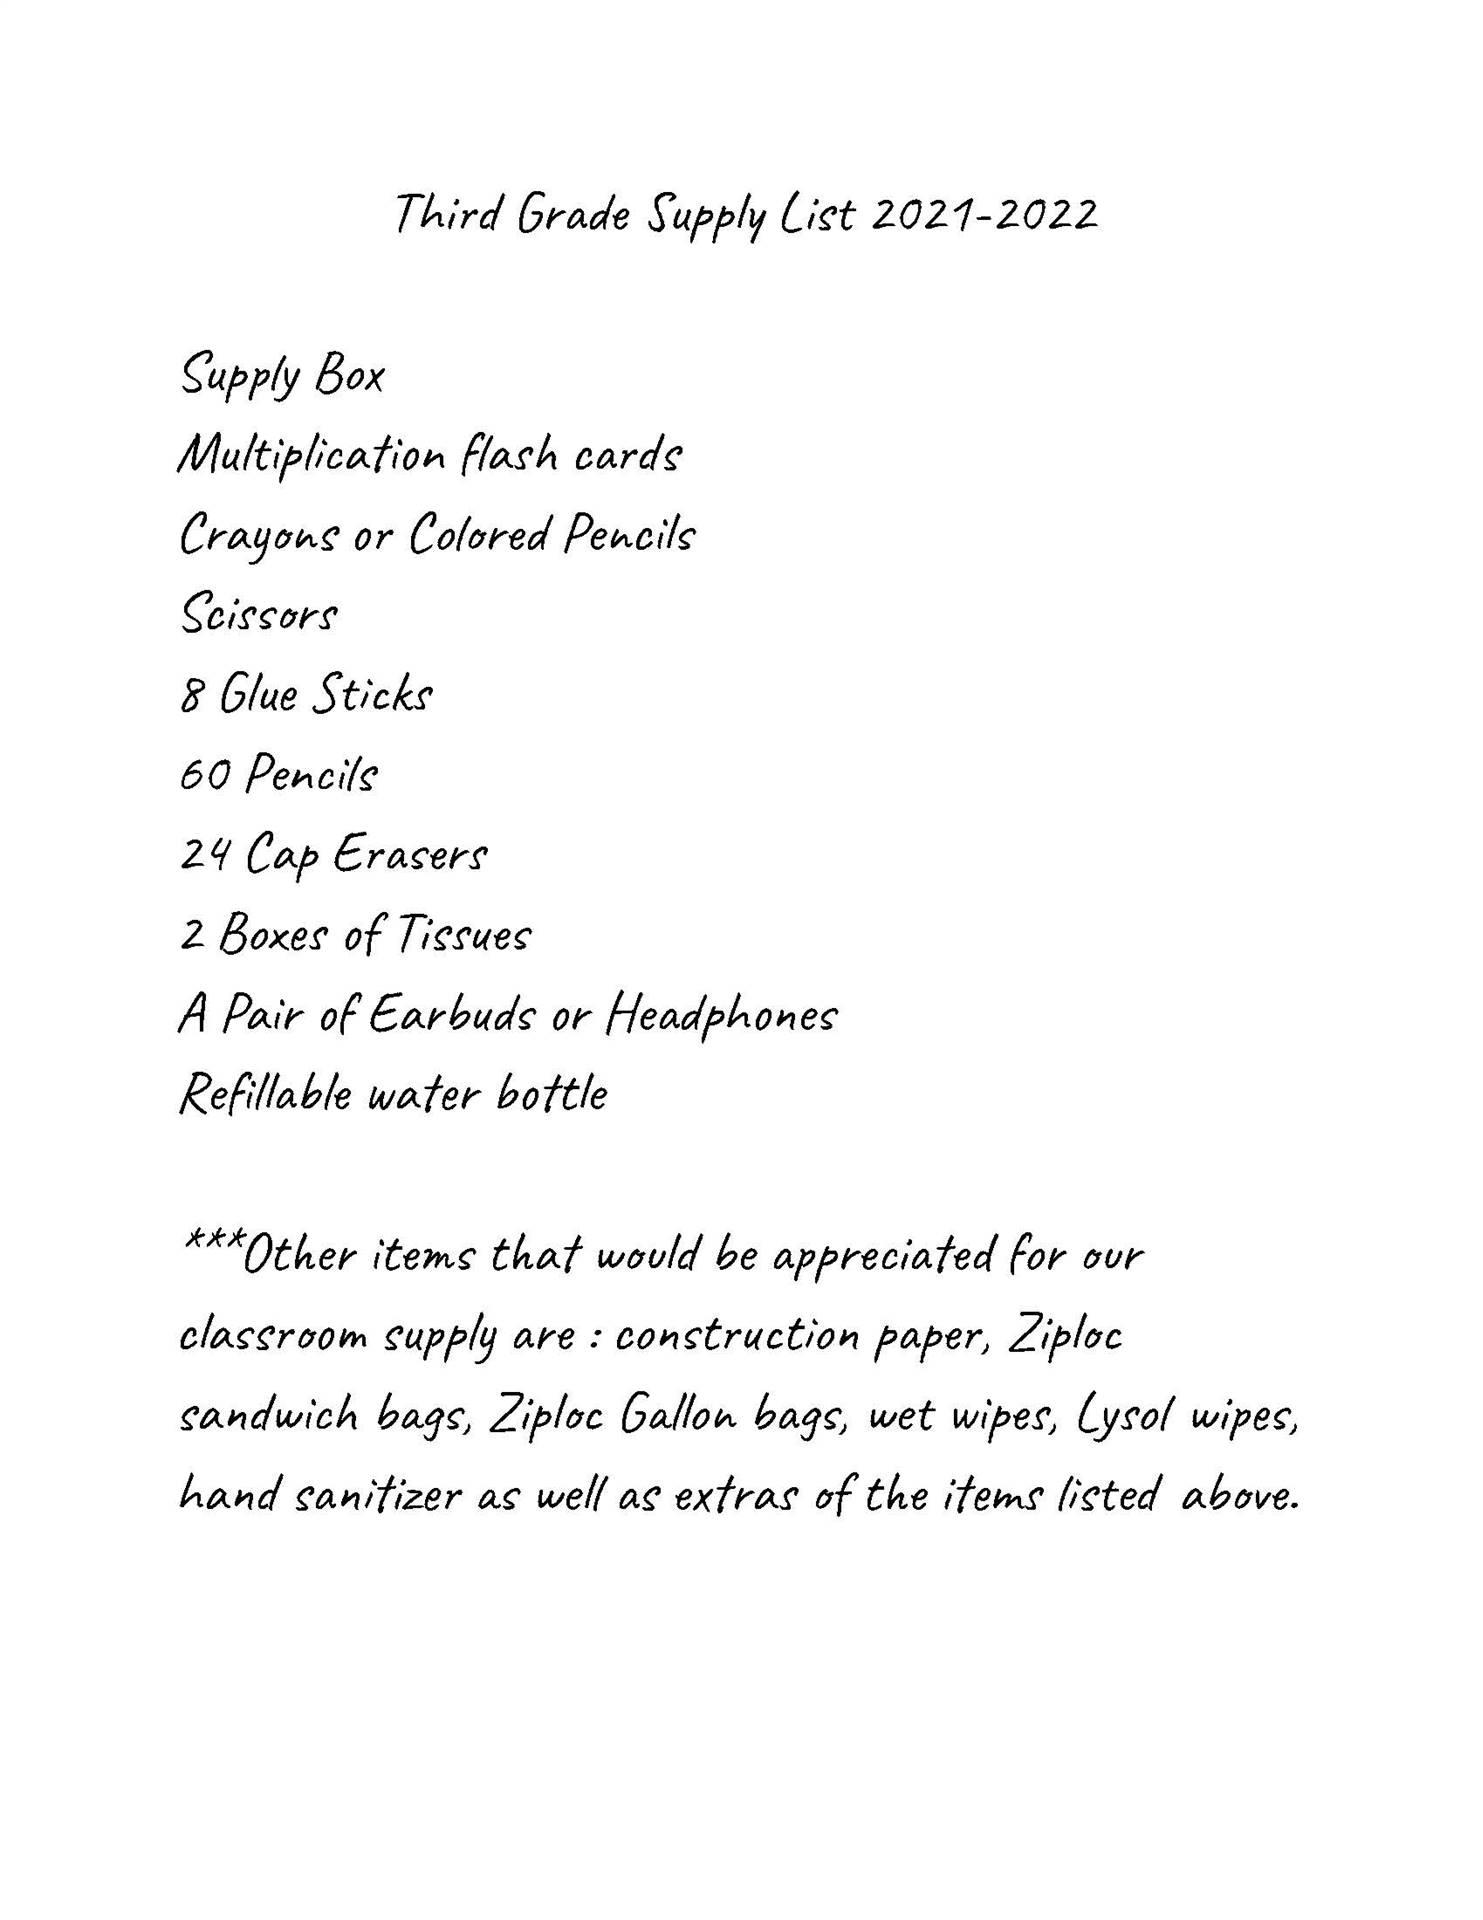 South 3rd Grade Supply List